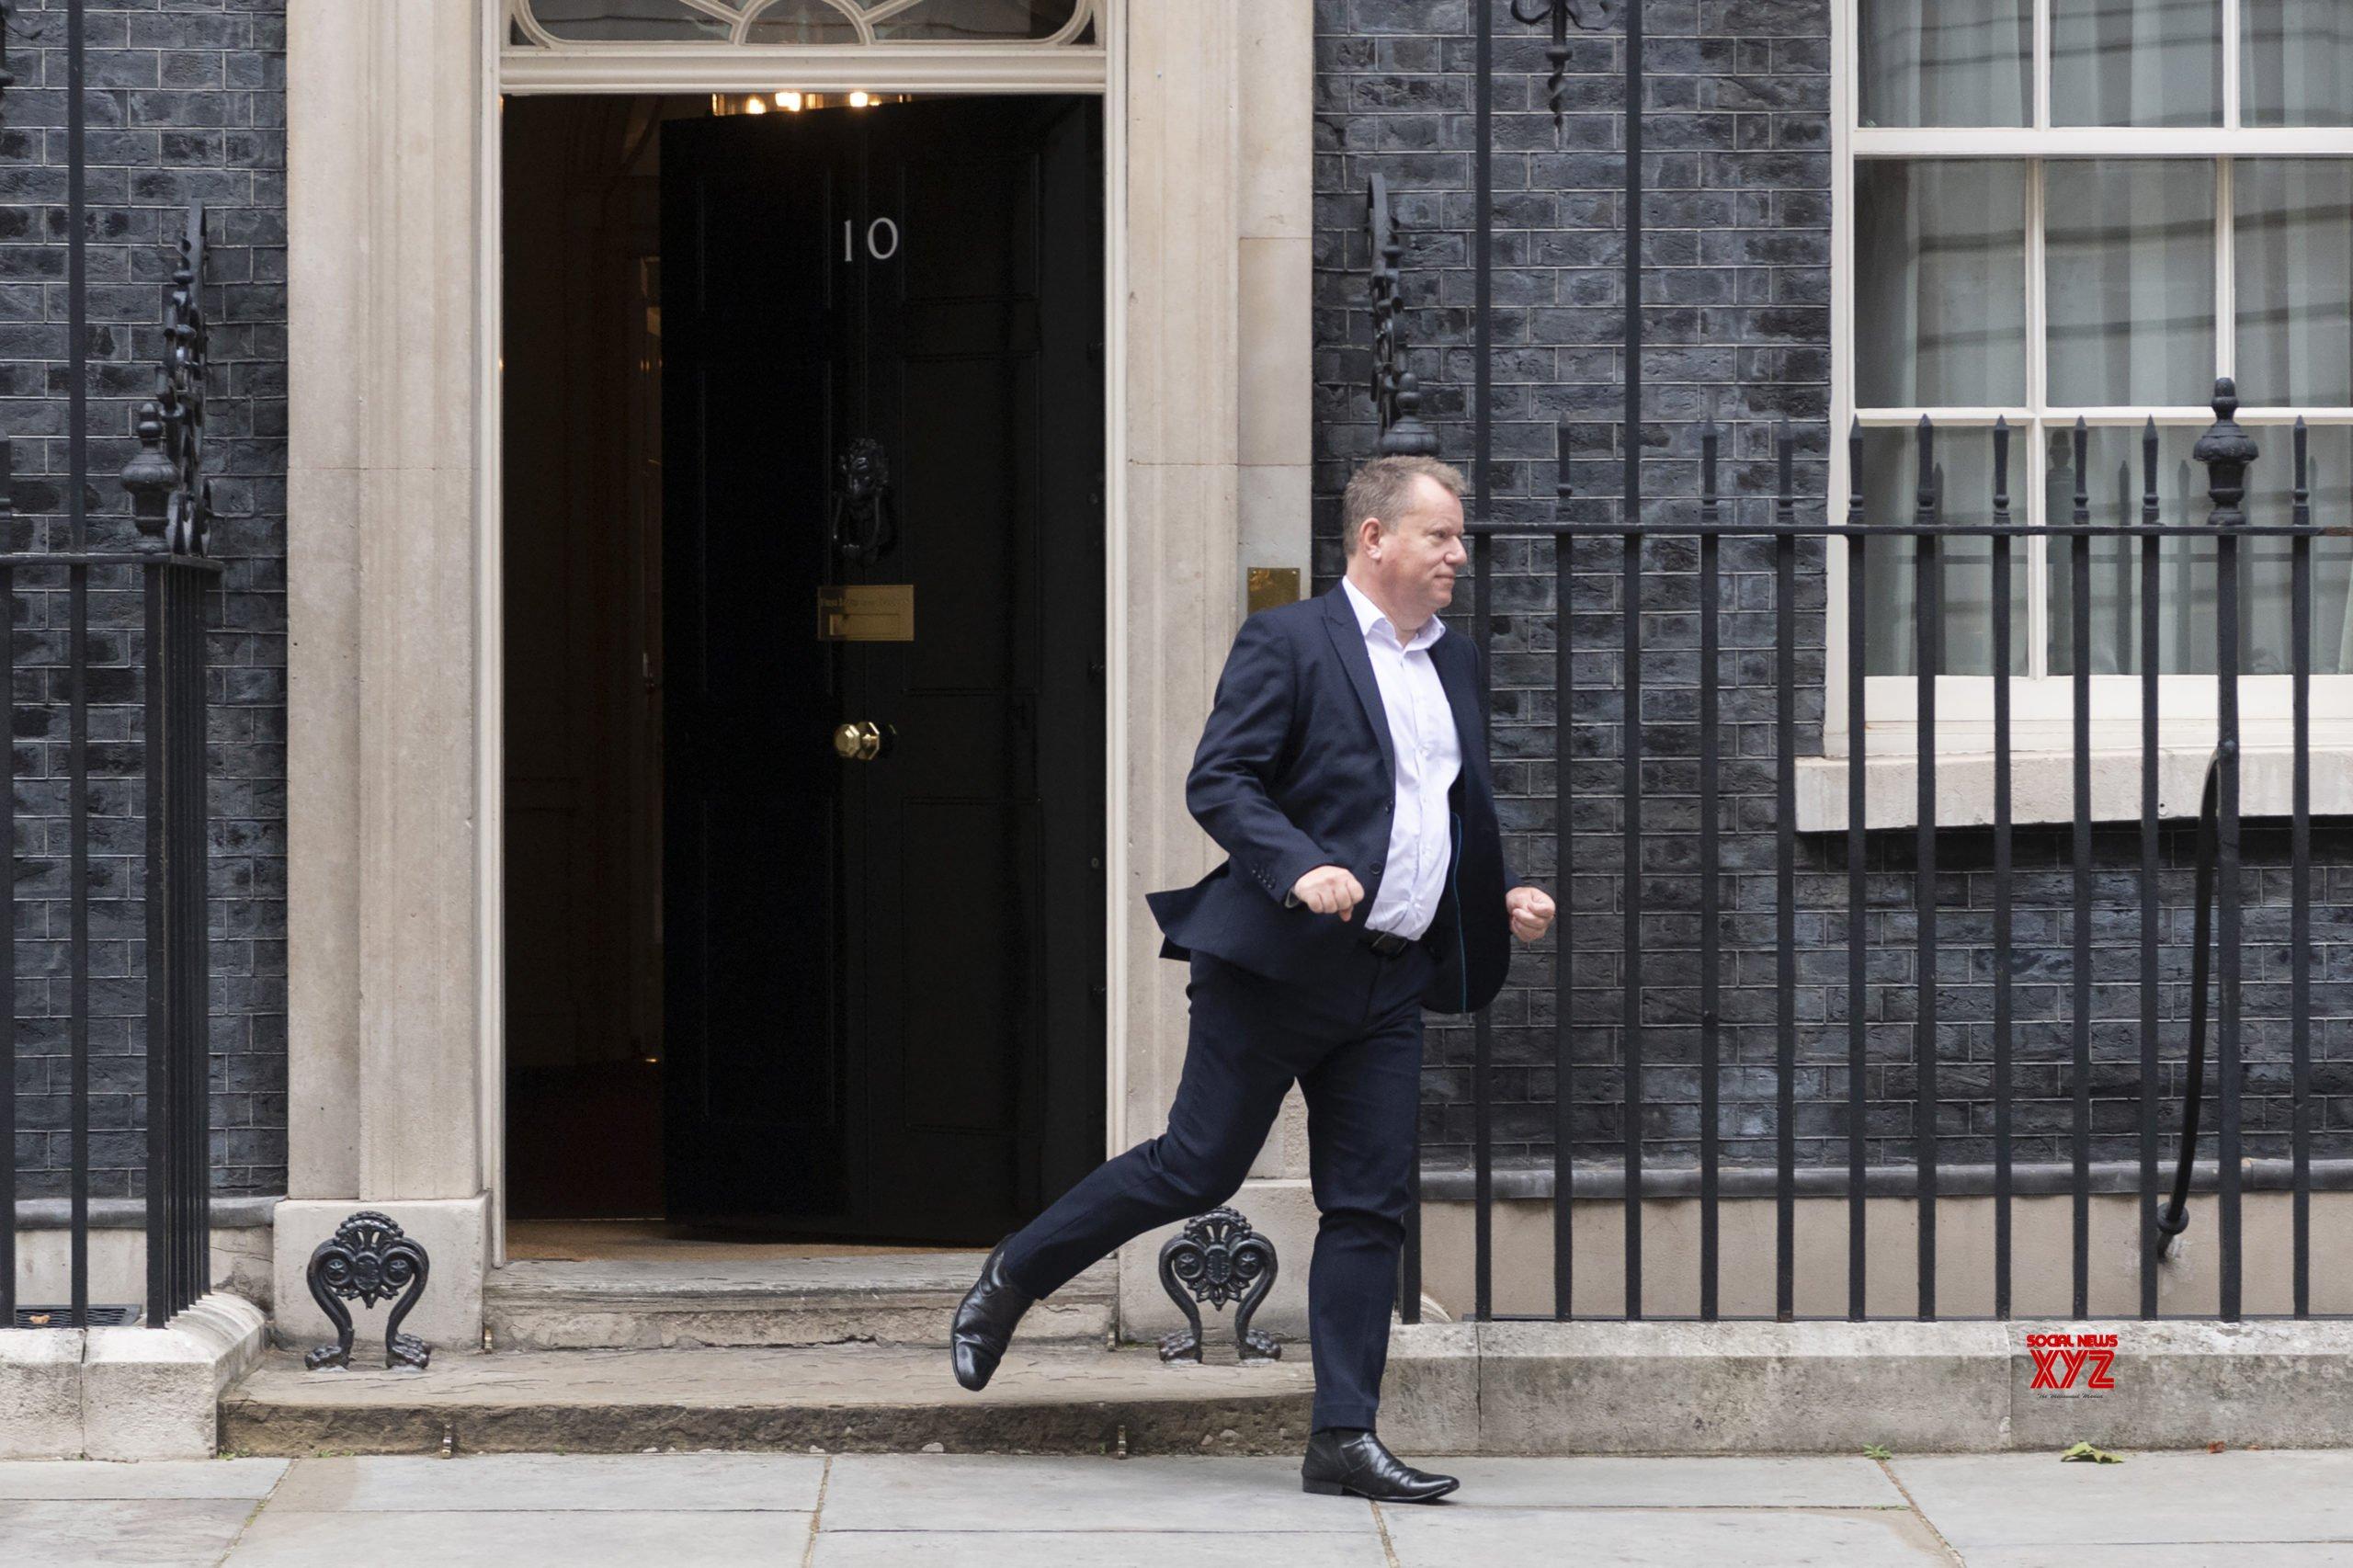 European Union demands United Kingdom drop a planned law that breaches Brexit deal